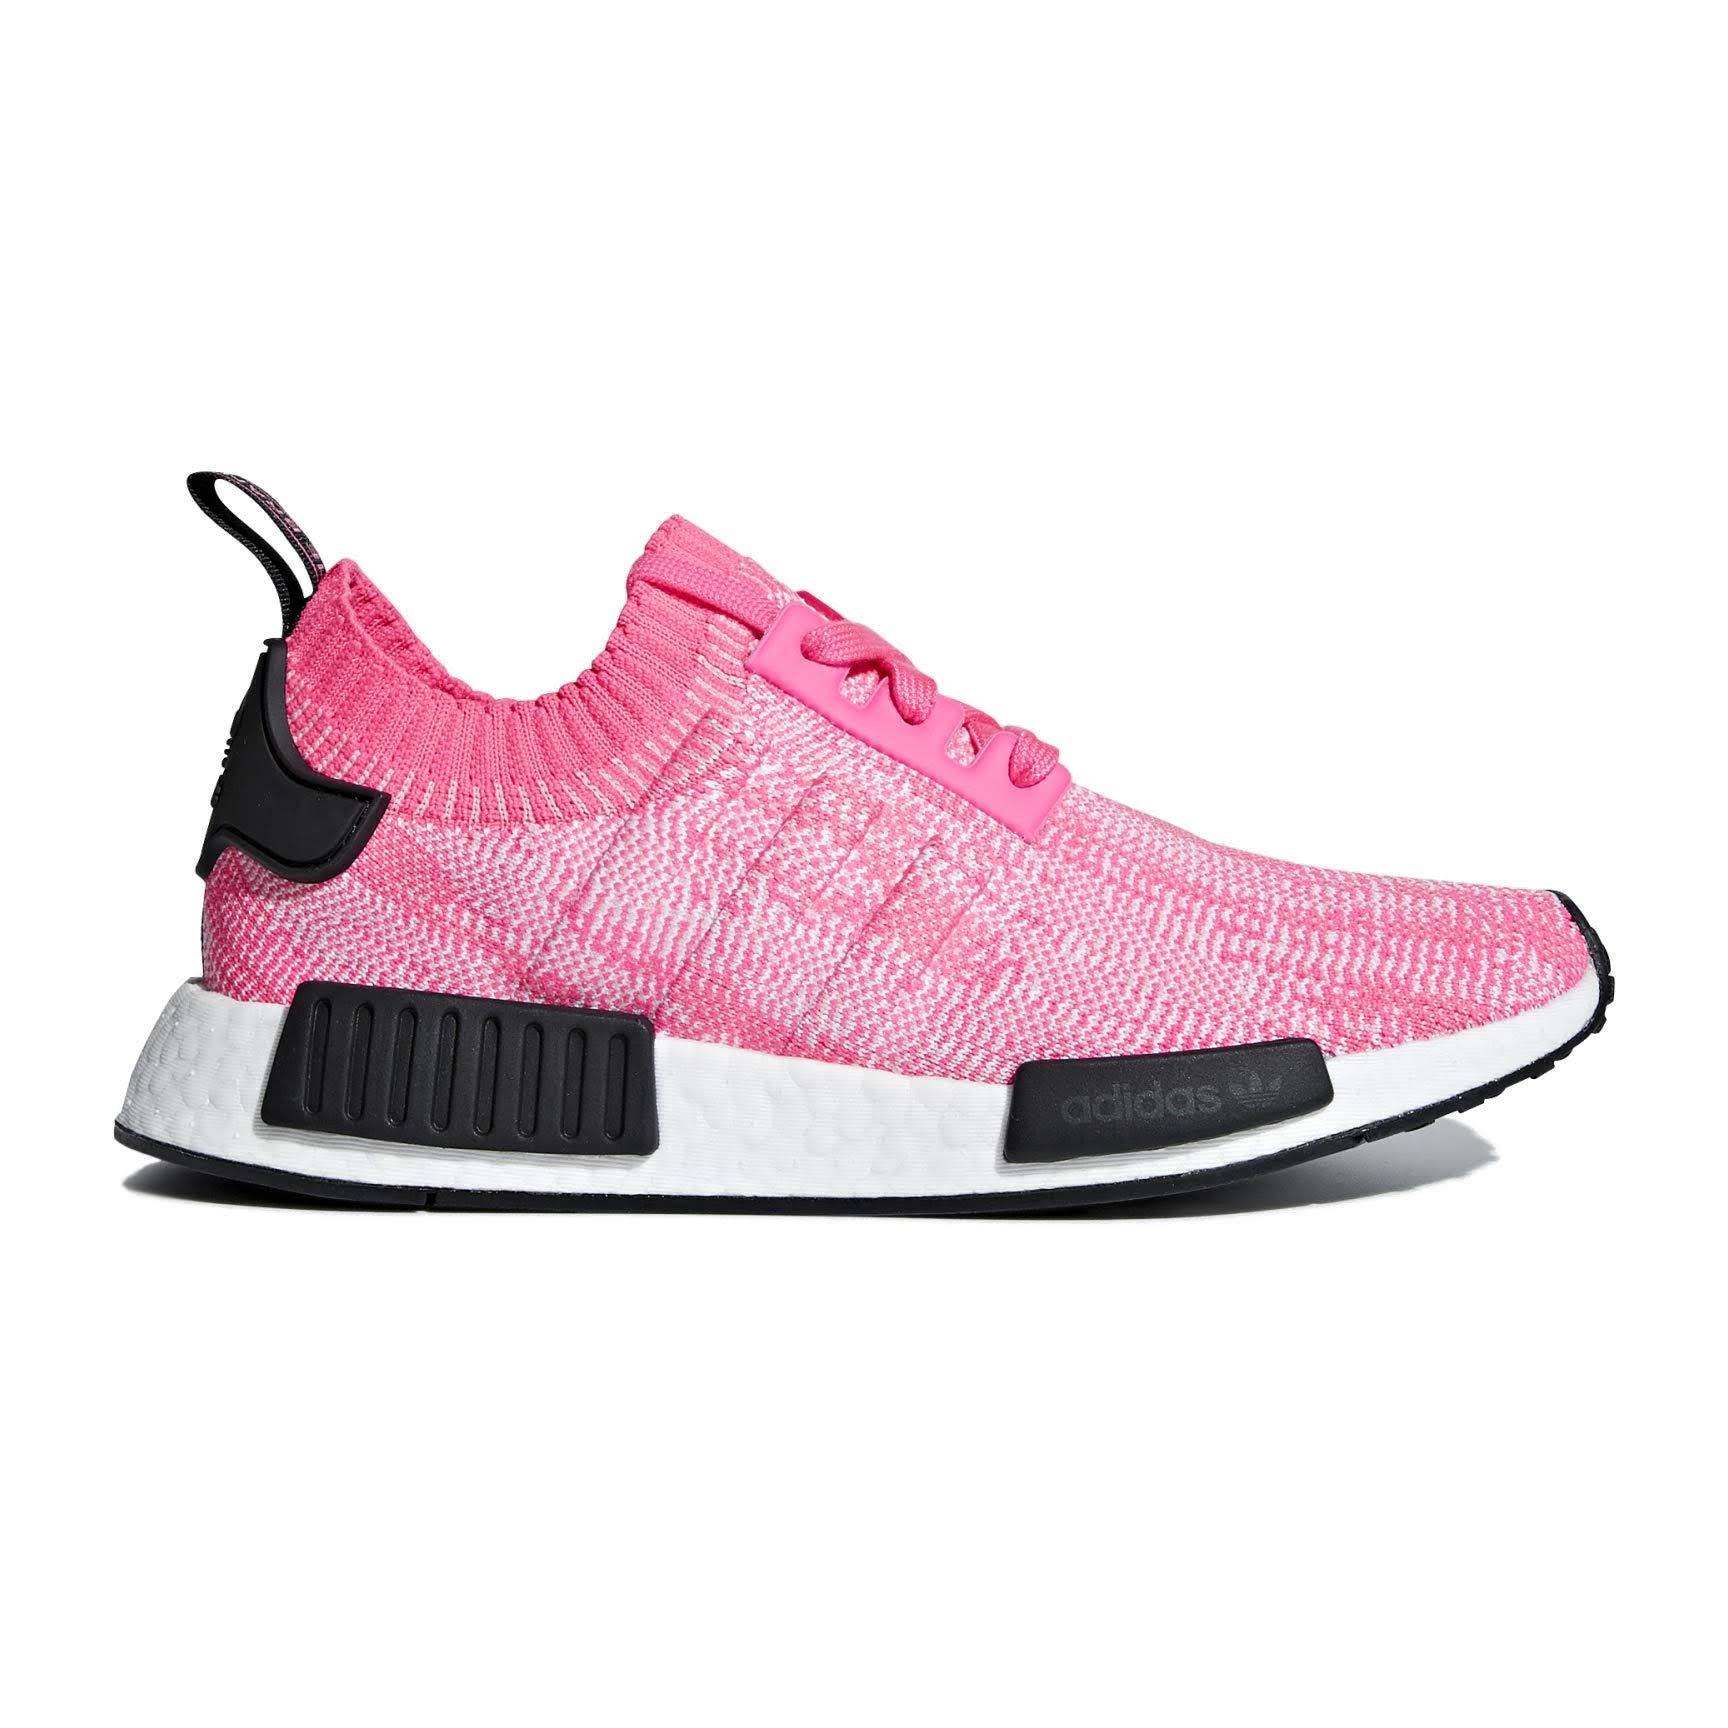 Pink' 'solar 0 Wmns Adidas Talla Mujer Primeknit r1 Nmd Para Zapatillas 7 wXY7qUx